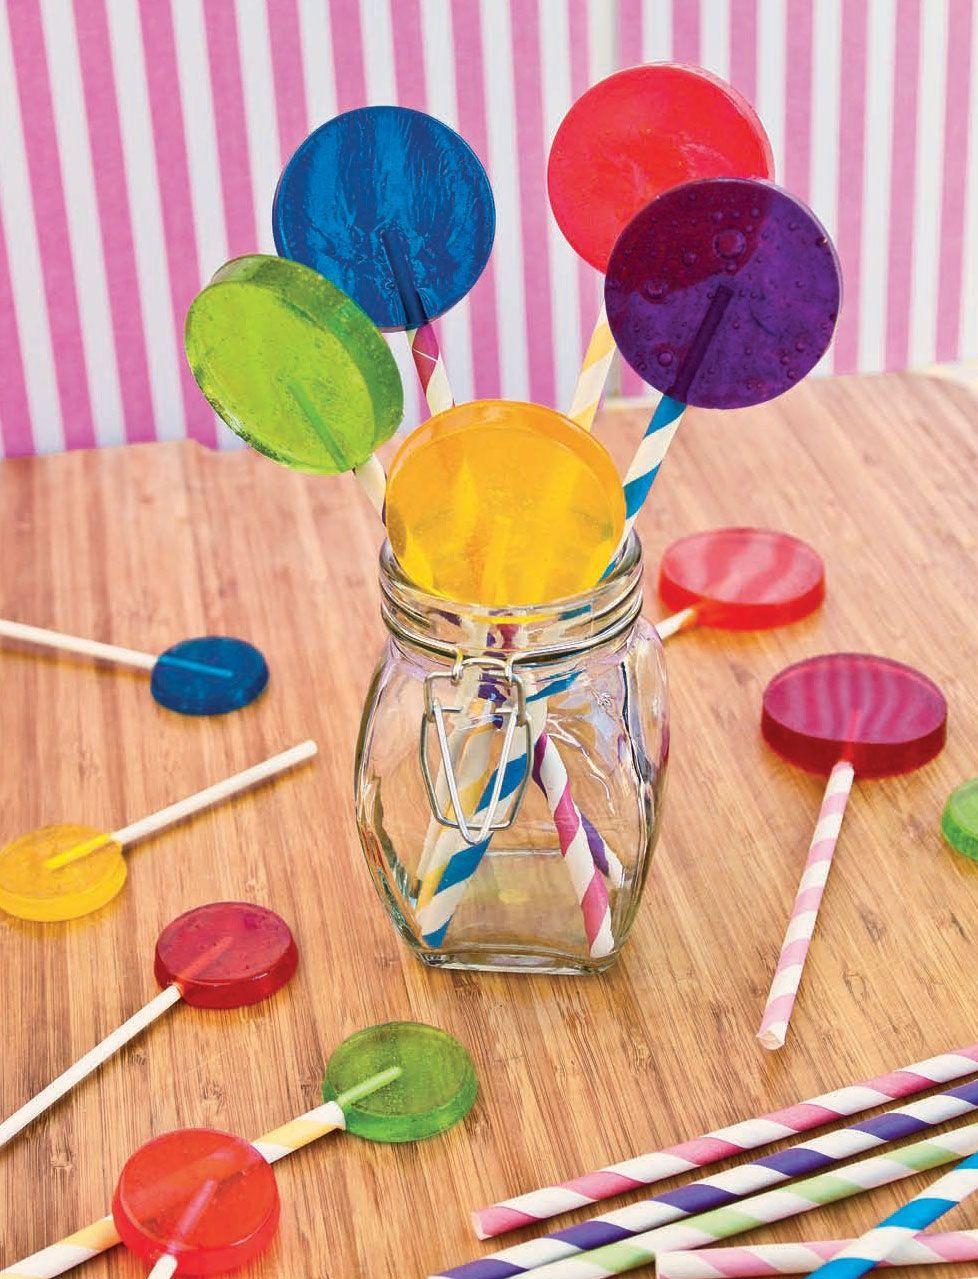 How to Make Homemade Lollipops   Candy   Homemade lollipops